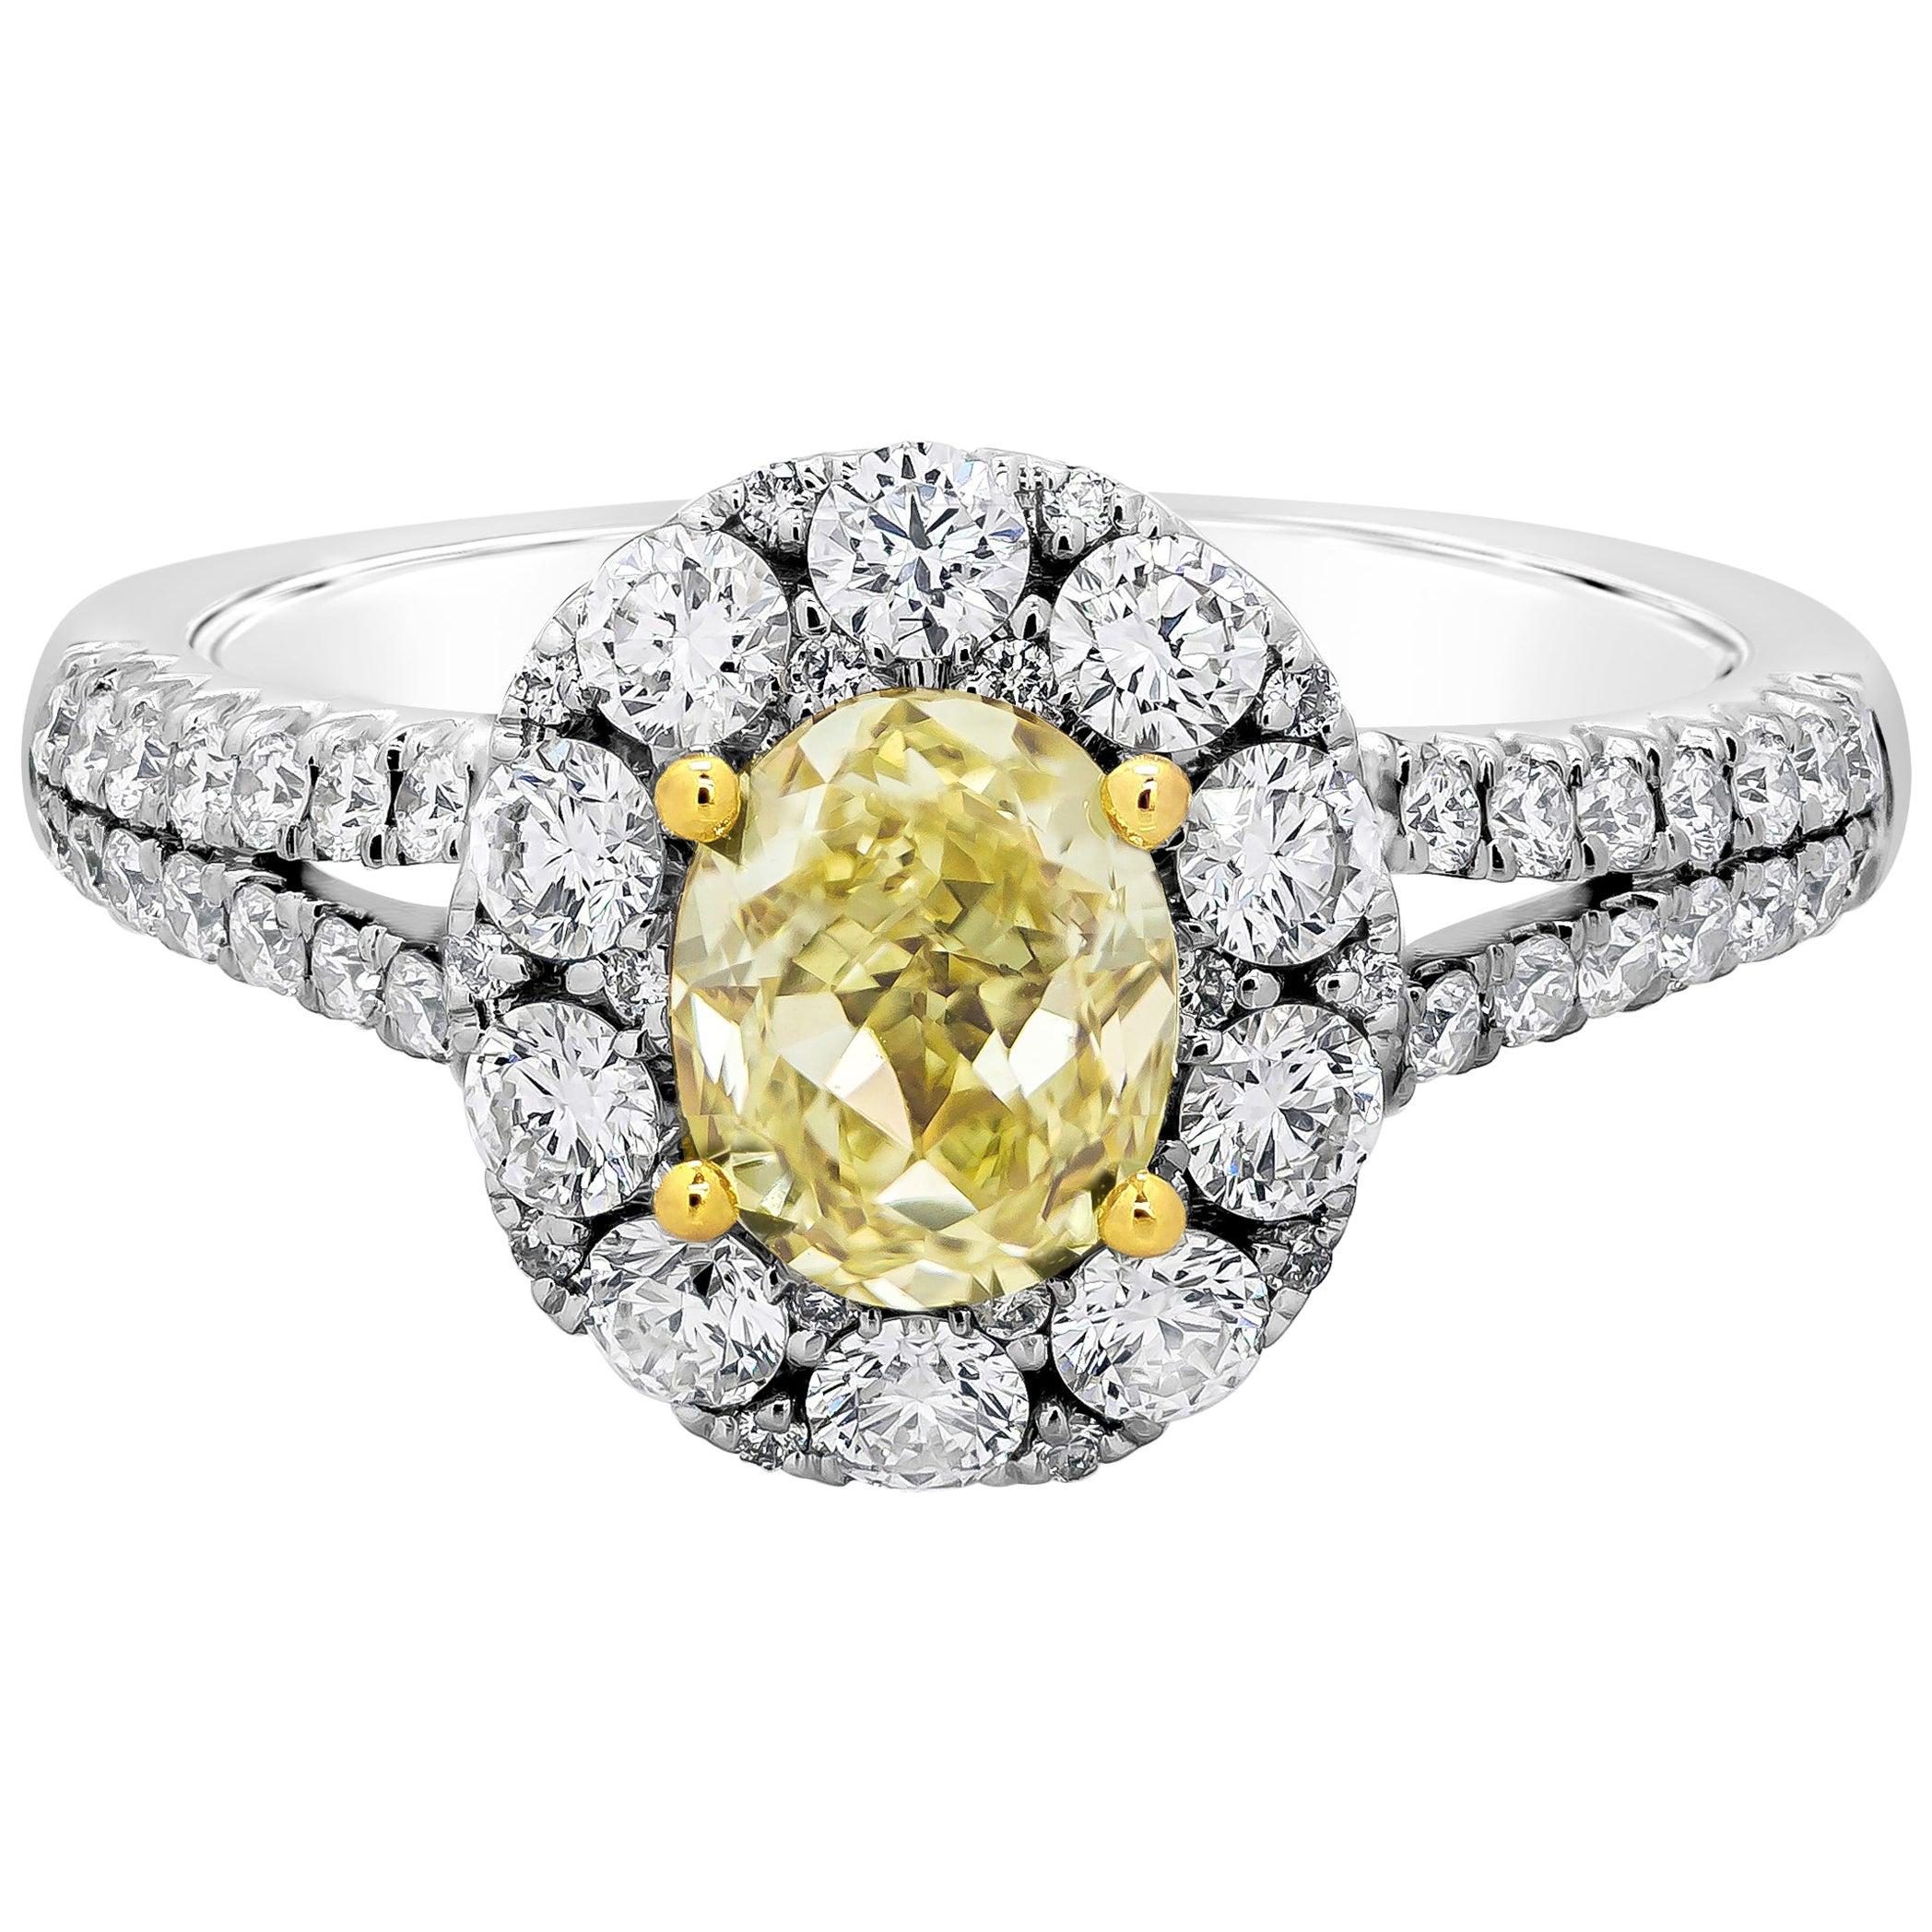 Roman Malakov, Oval Cut Yellow Diamond Halo Split-Shank Engagement Ring